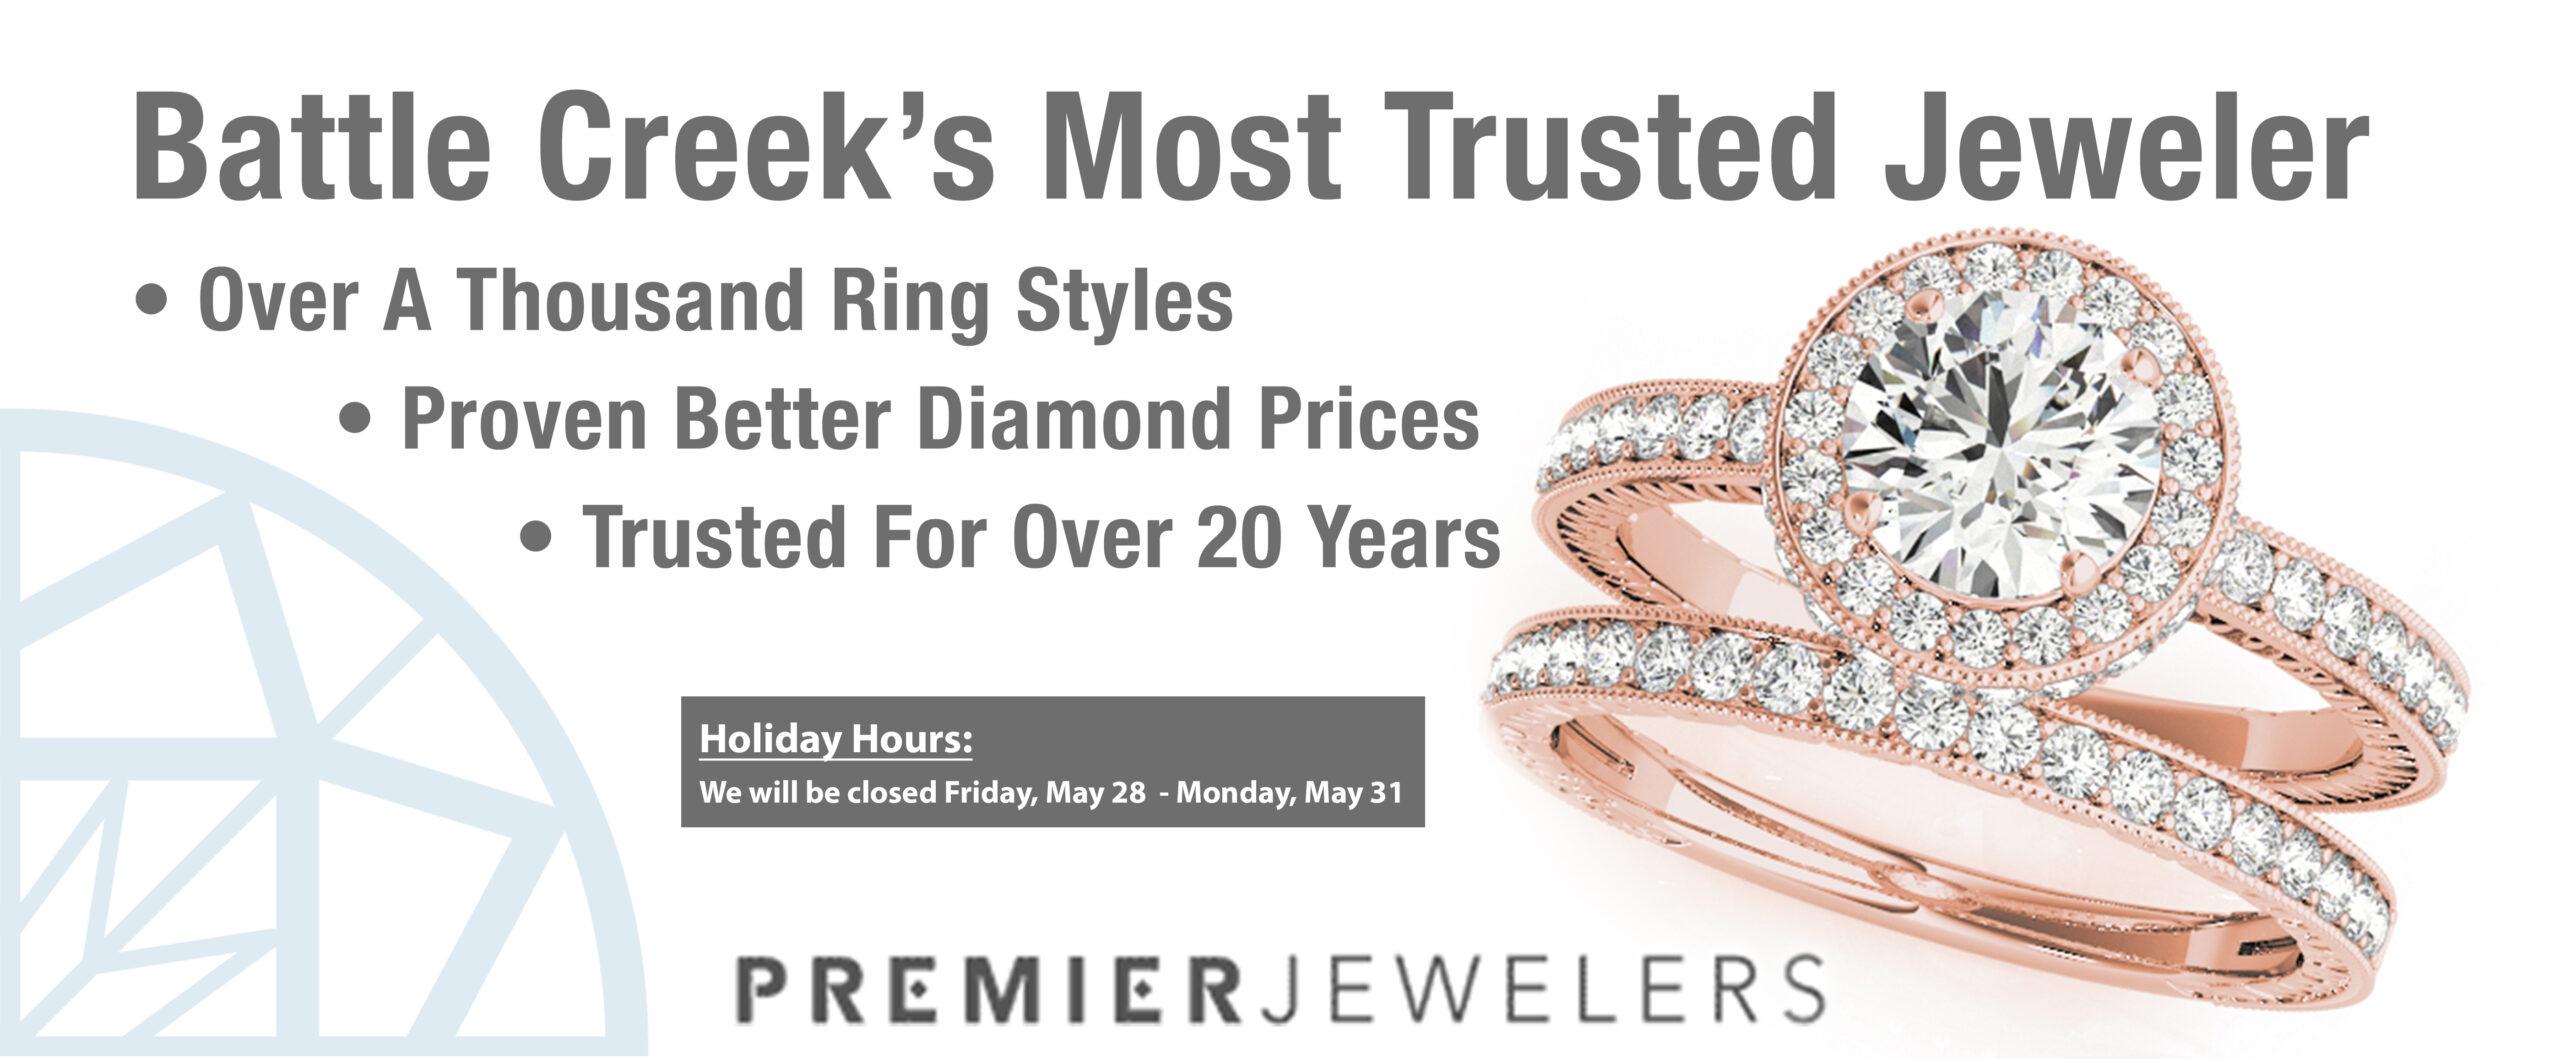 Premier Jewelers, Battle Creek, MI